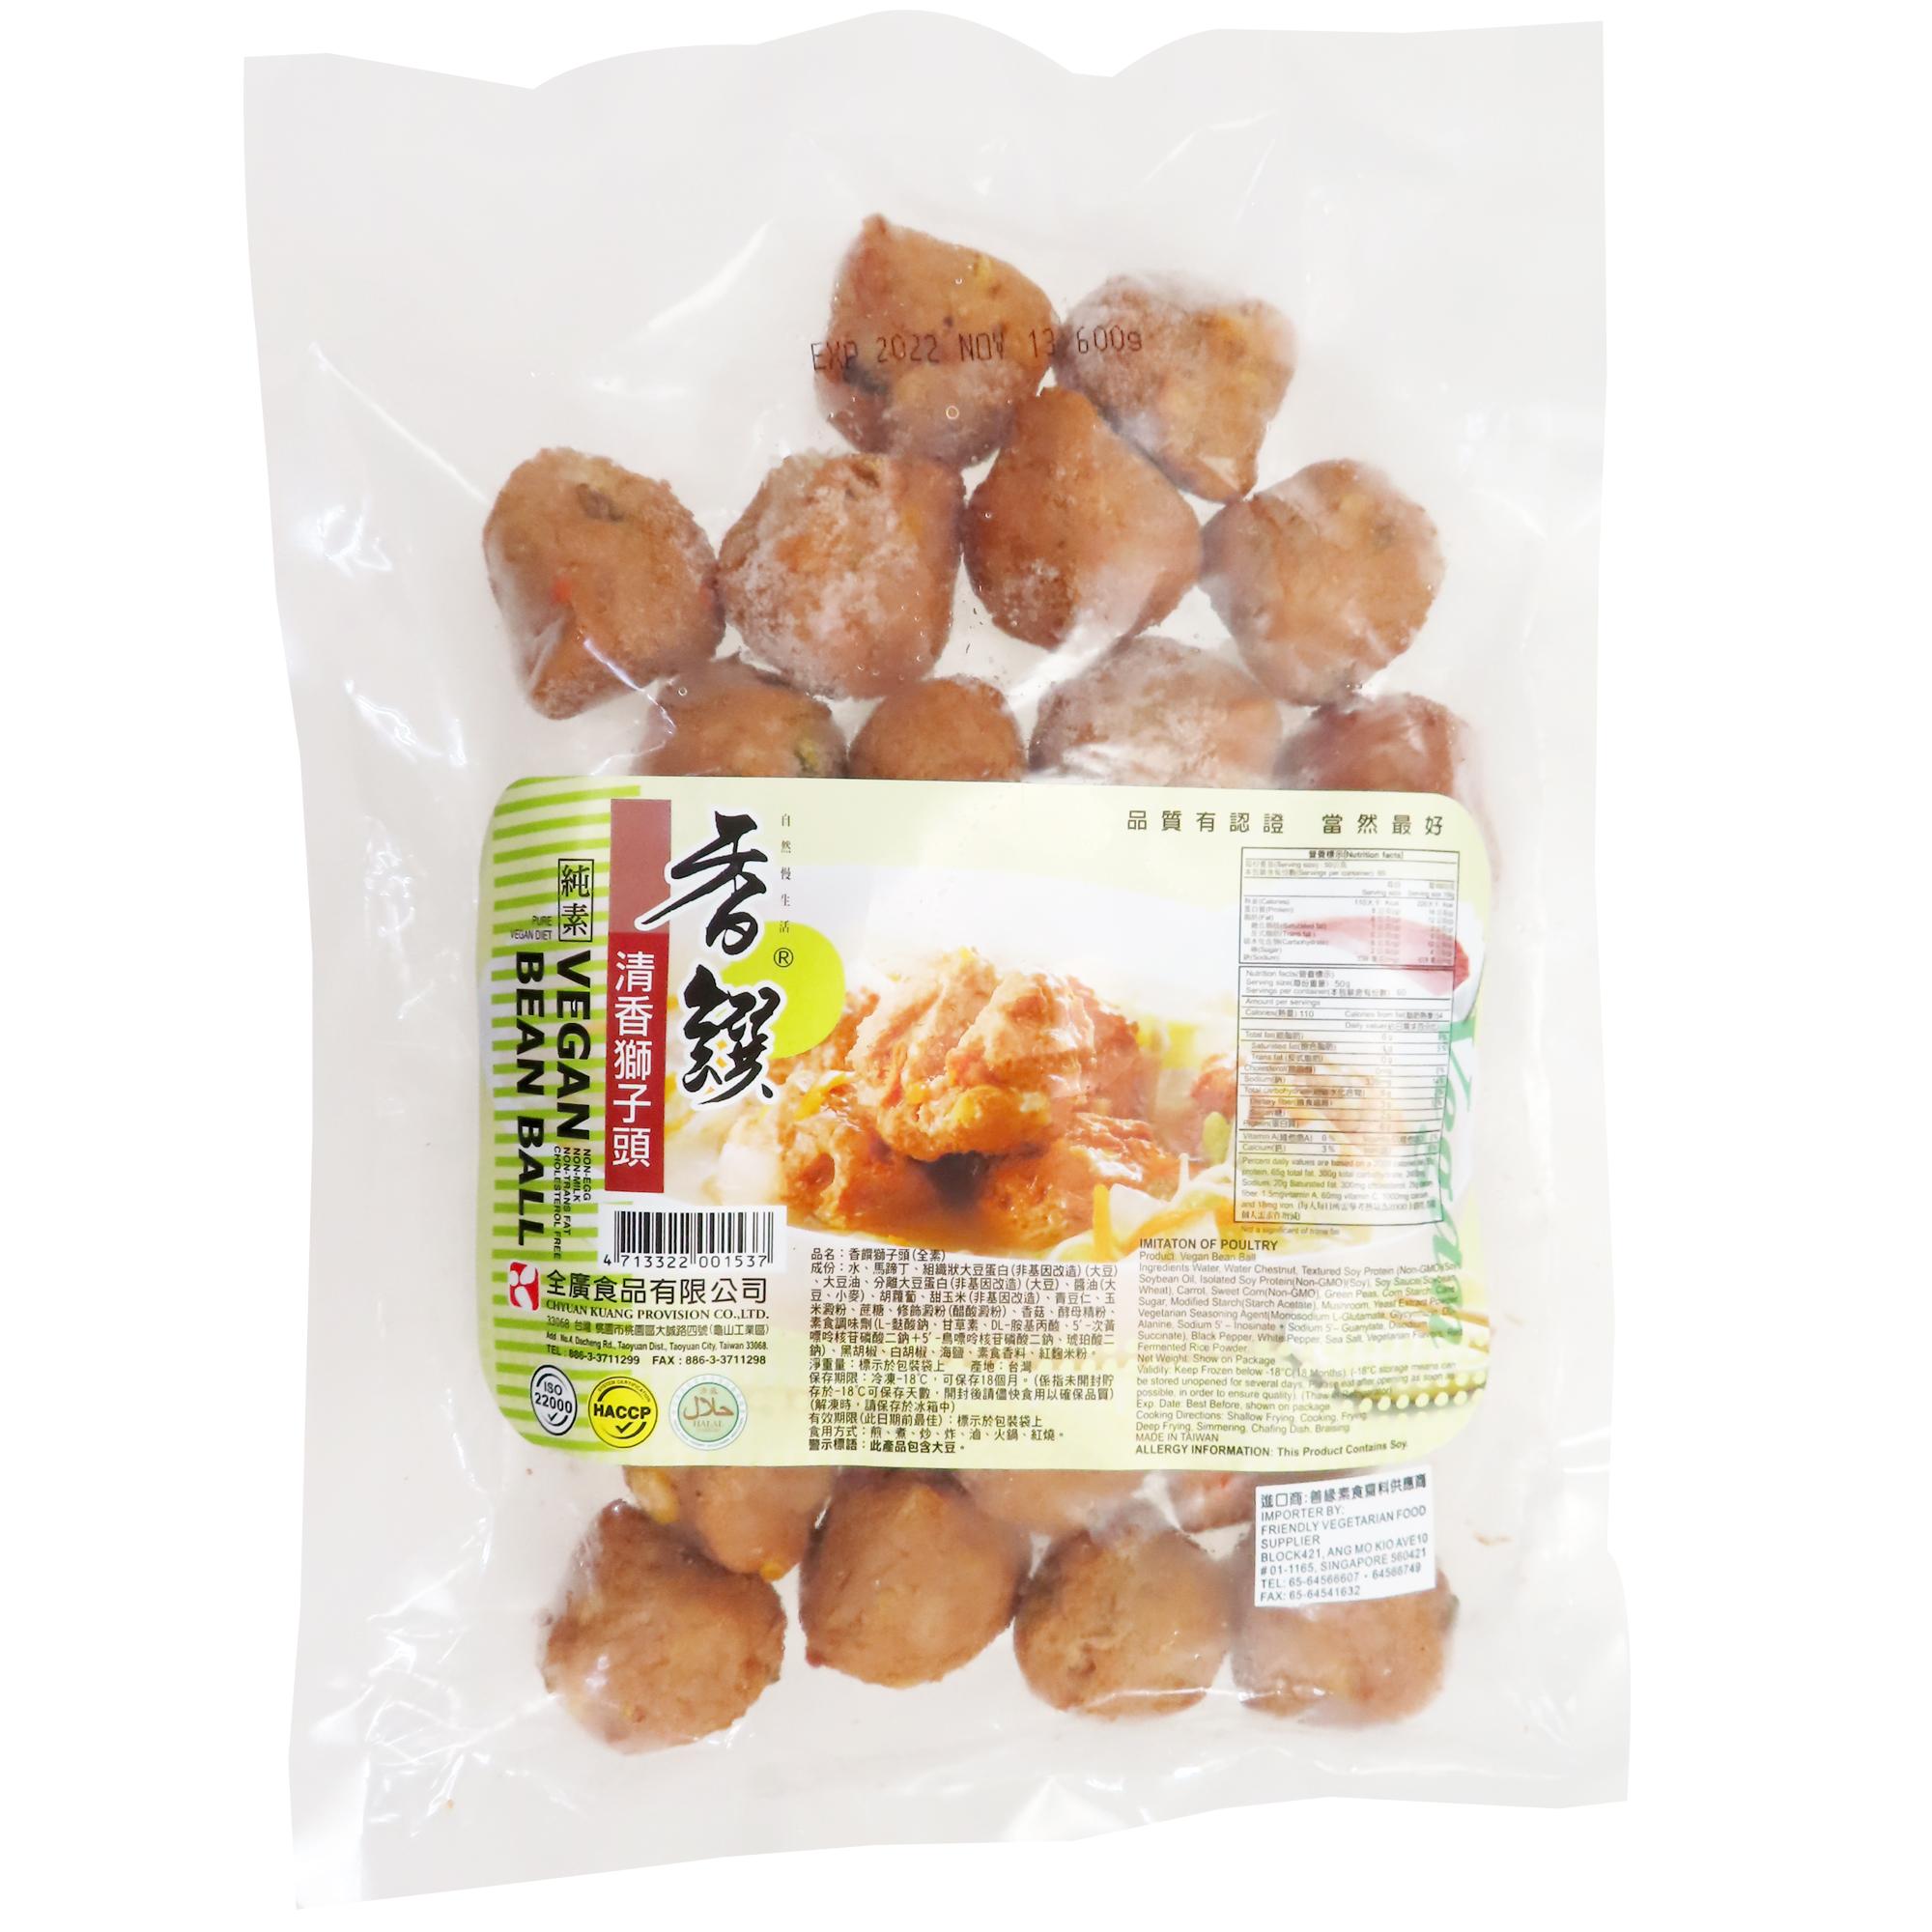 Image Vegan Soy Ball 全广-纯素香馔狮子头 600grams